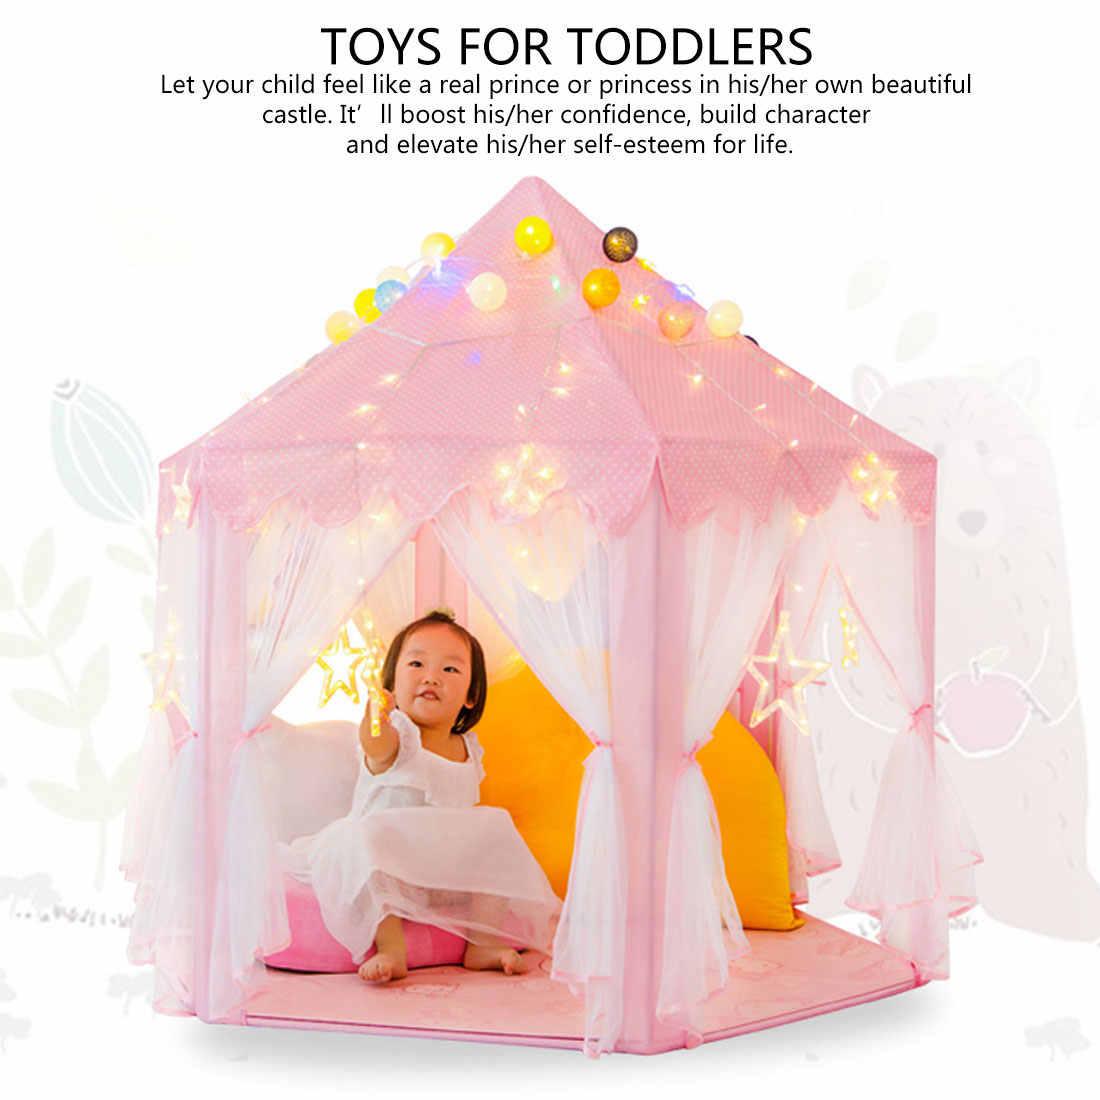 1.35 M Diameter Portable Anak-anak Castle Bermain Tenda Rumah Kecil Rumah Lipat Bayi Beach Tenda untuk Anak Anak